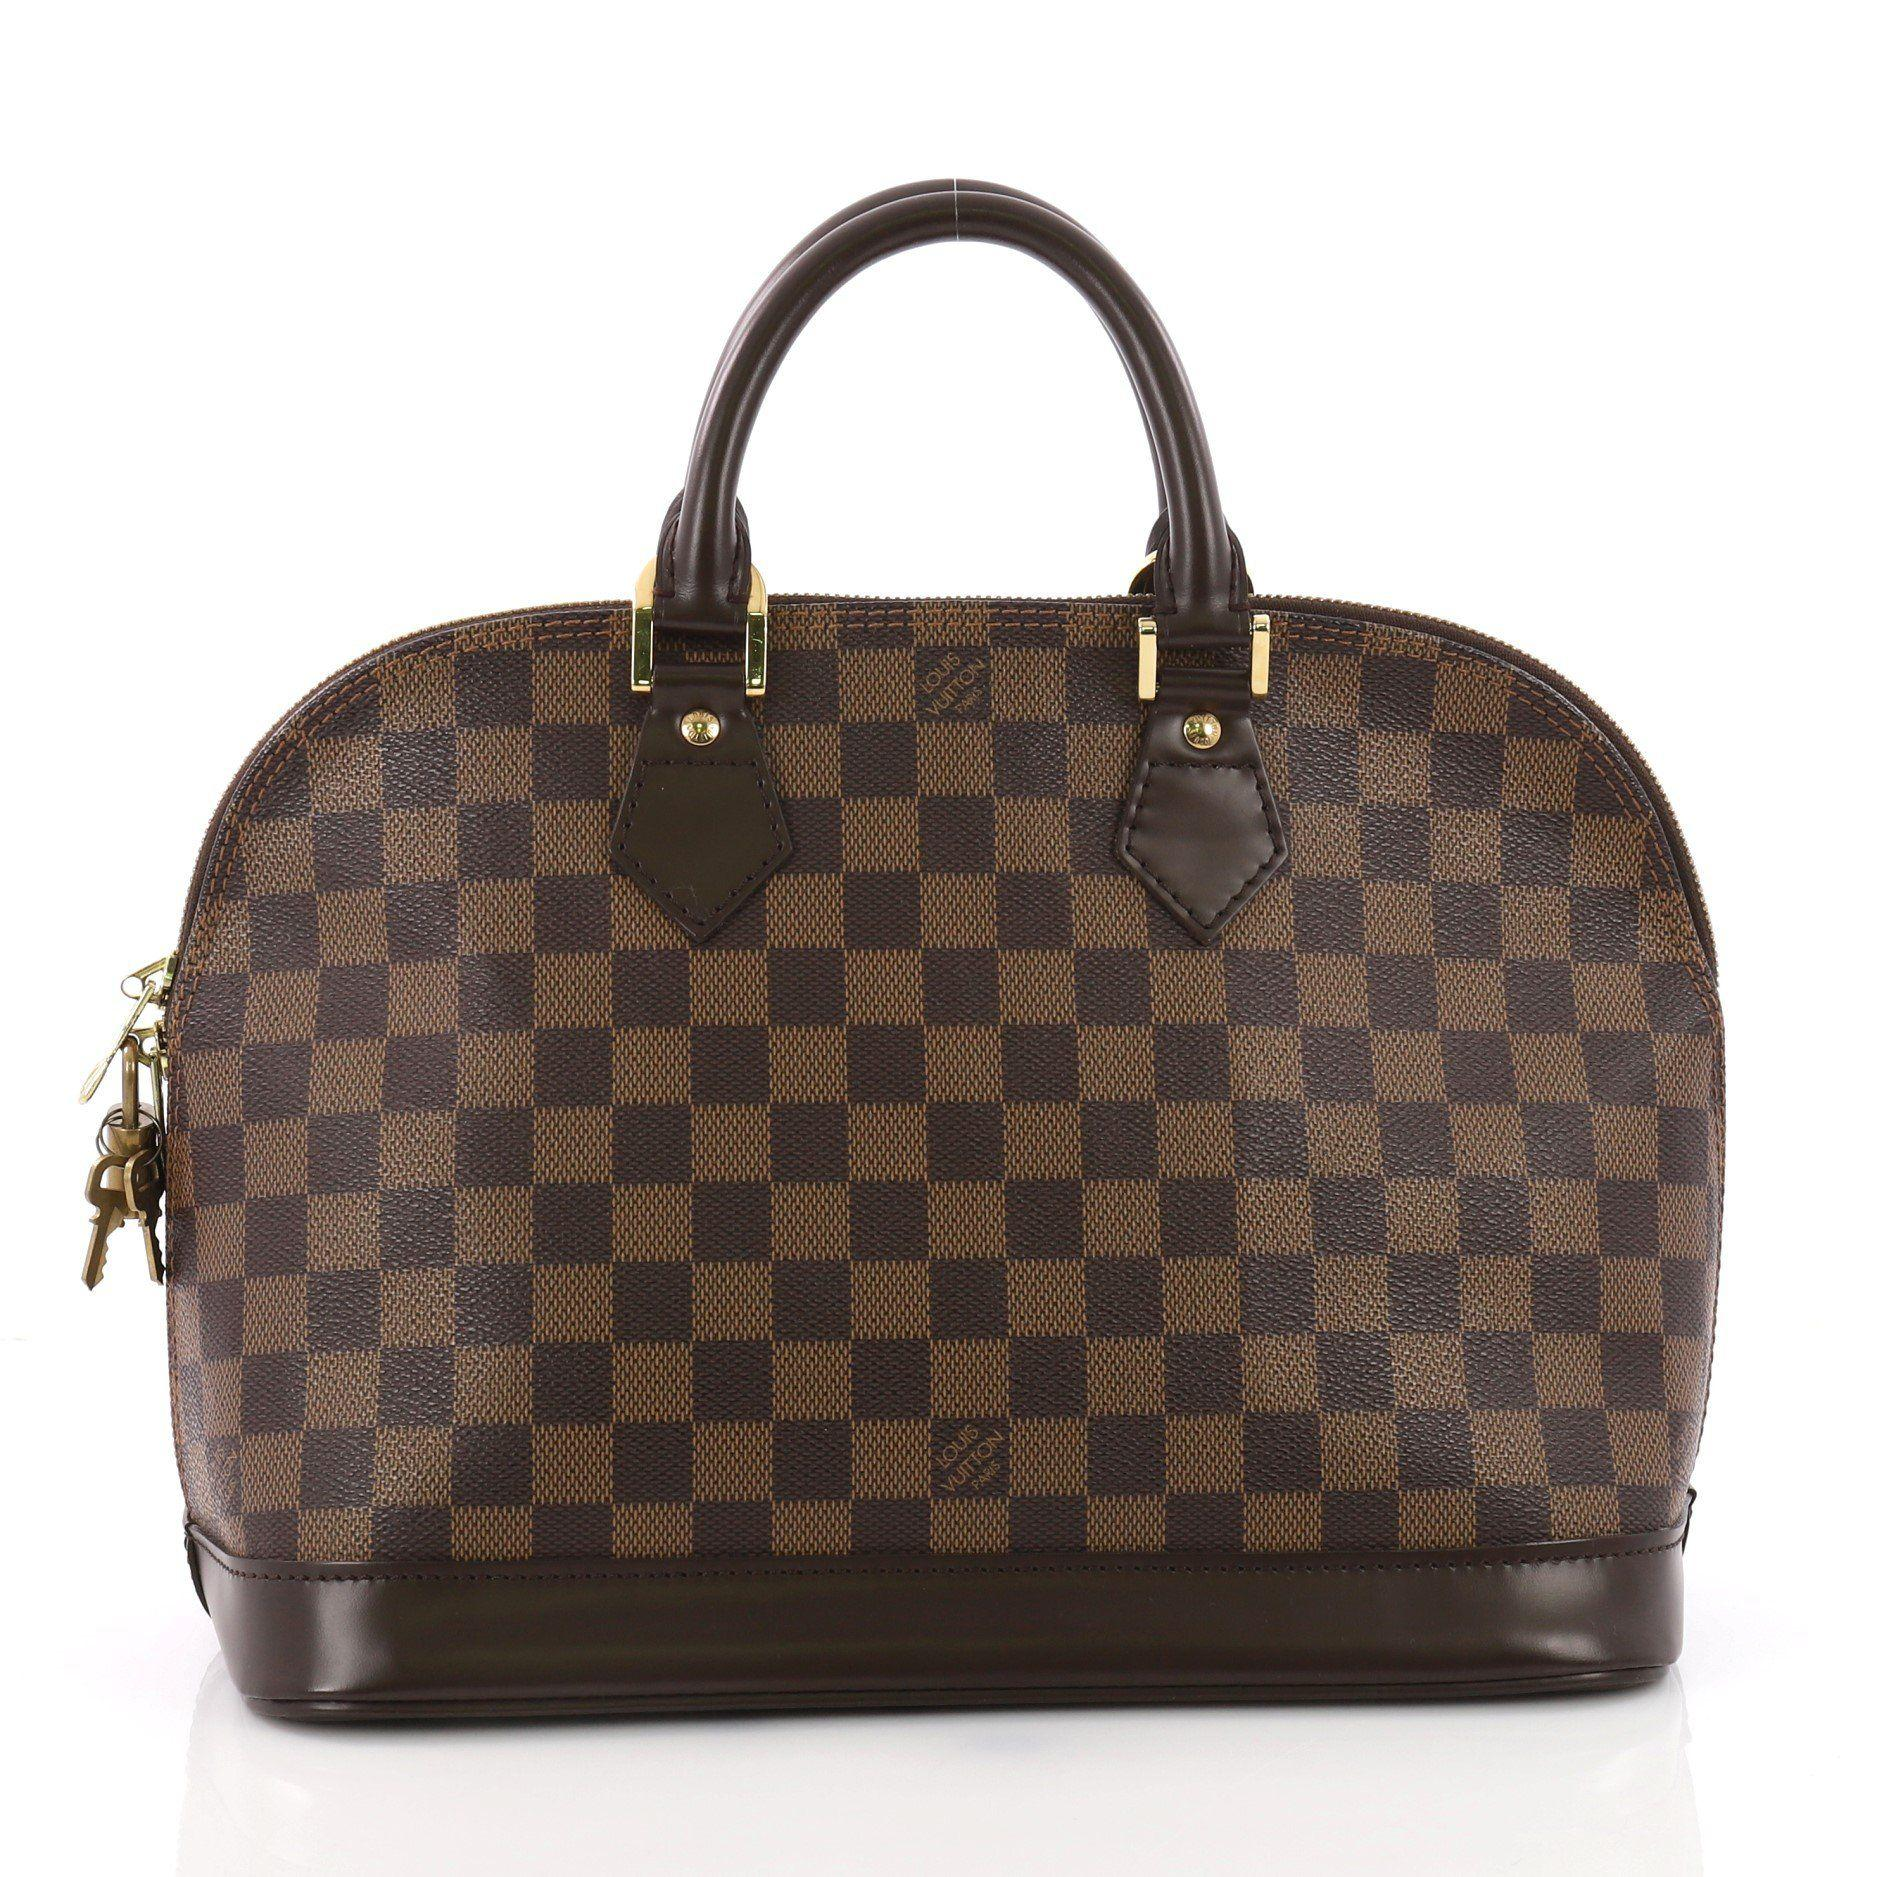 8eb6e0db5c04 Louis Vuitton - Brown Pre Owned Alma Handbag Damier Pm - Lyst. View  fullscreen